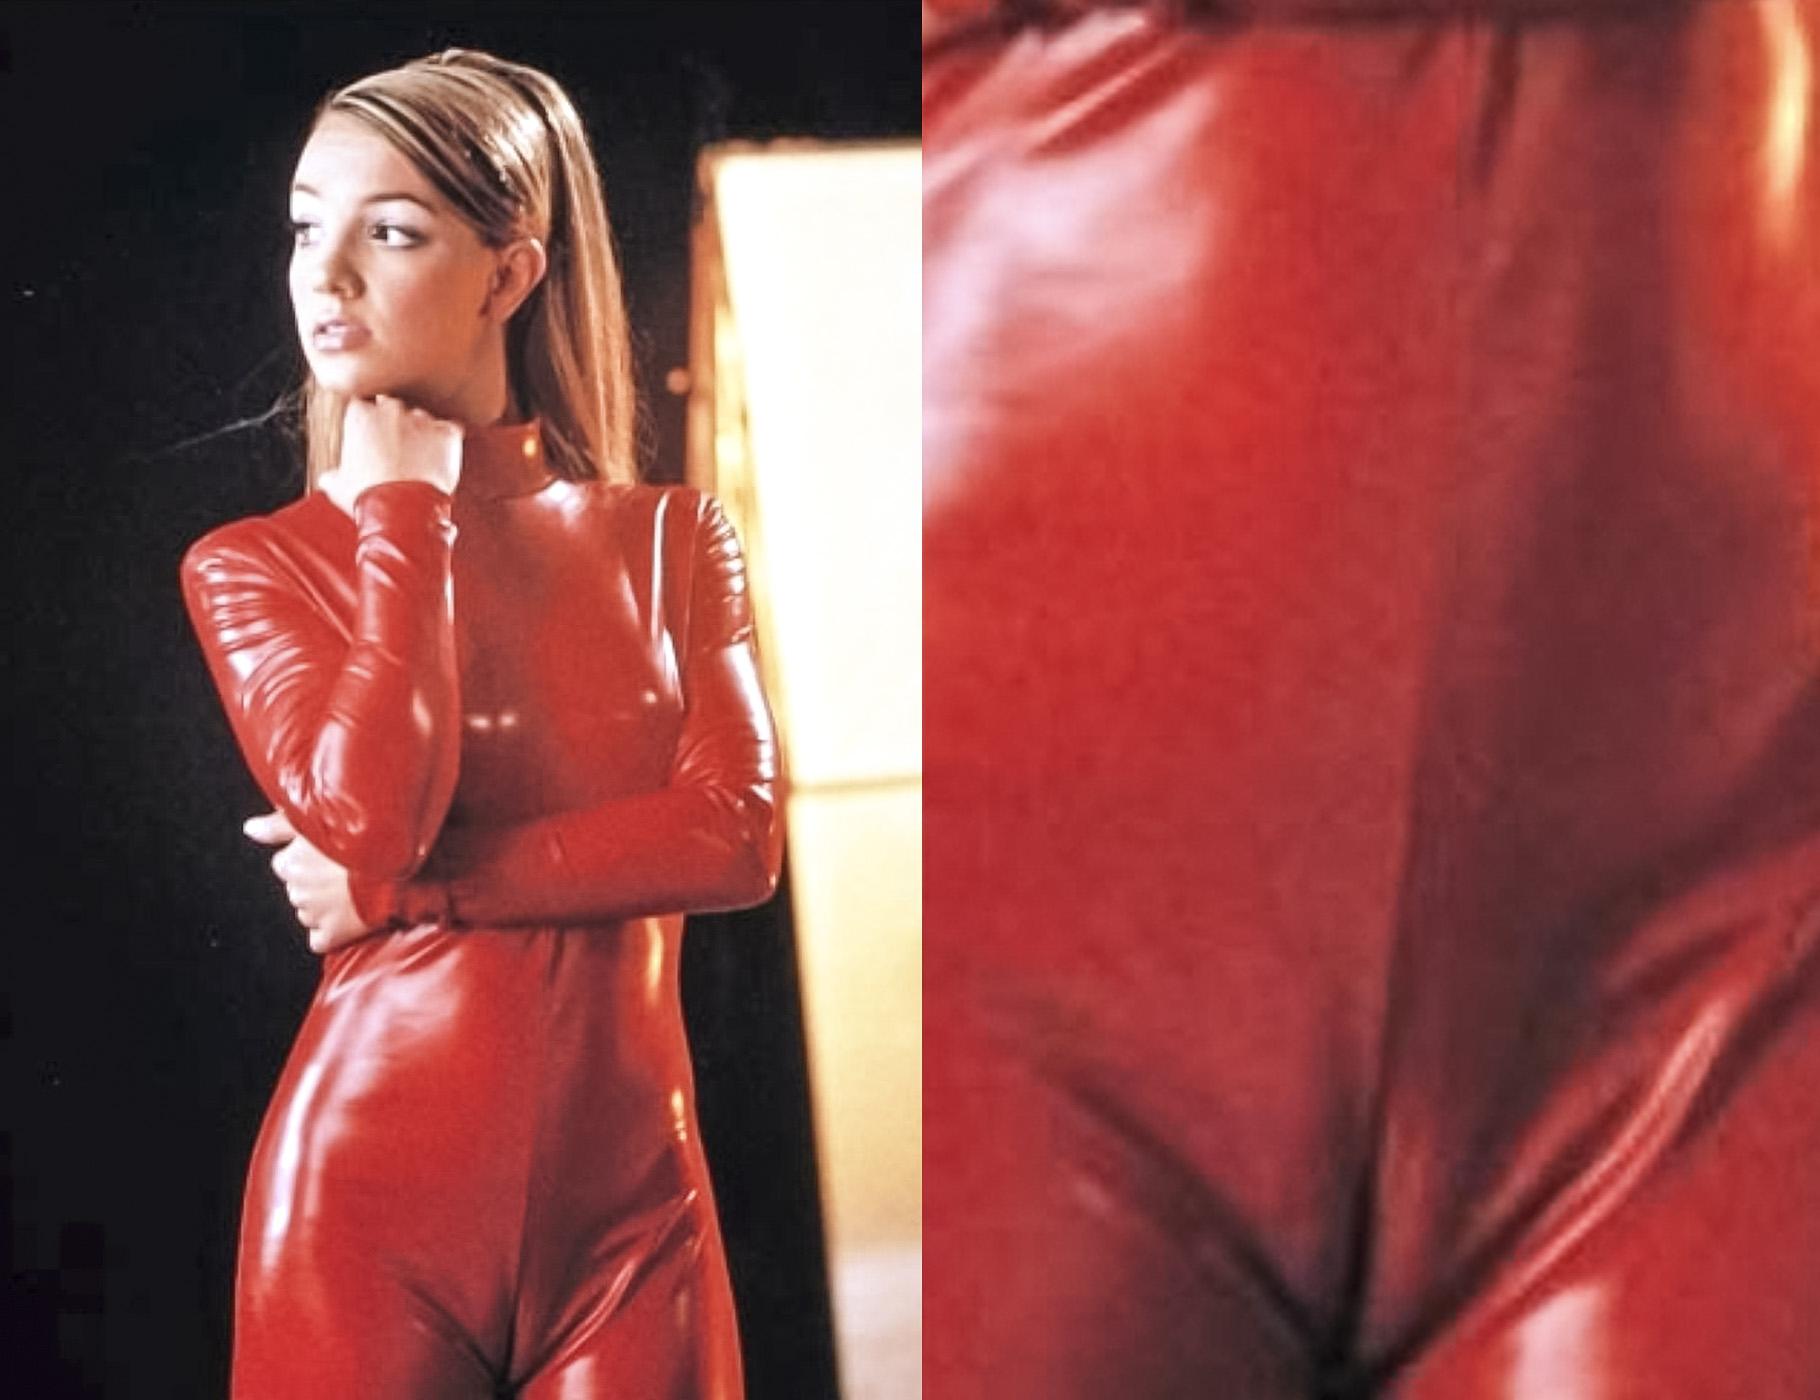 Britney Spears camel toe - Britney Spears cameltoe